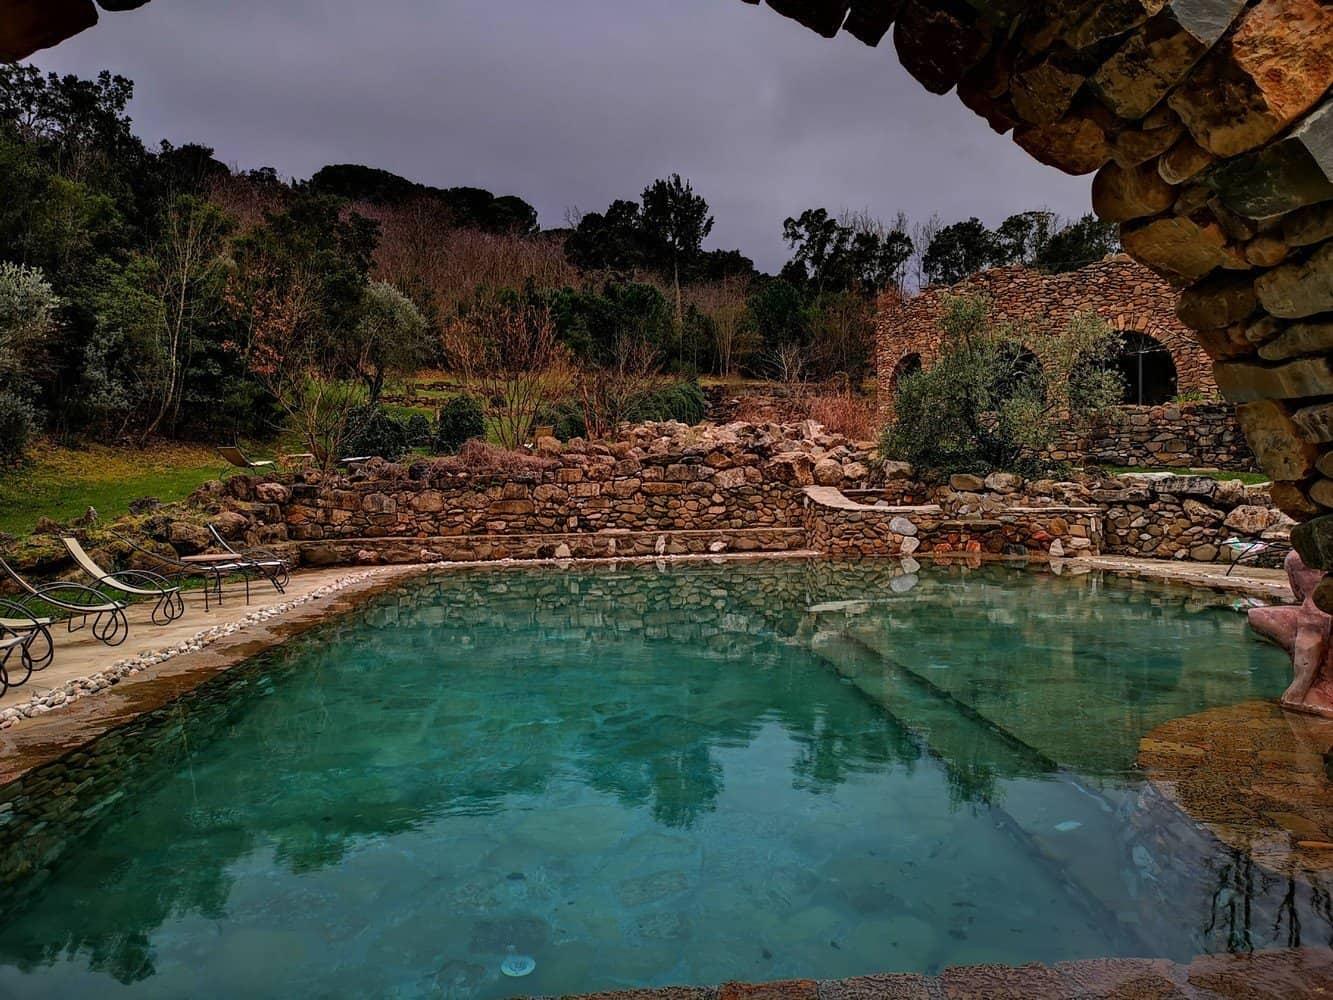 Terme San Casciano Dei Bagni Fonteverde Spa Ingressi E Prezzi